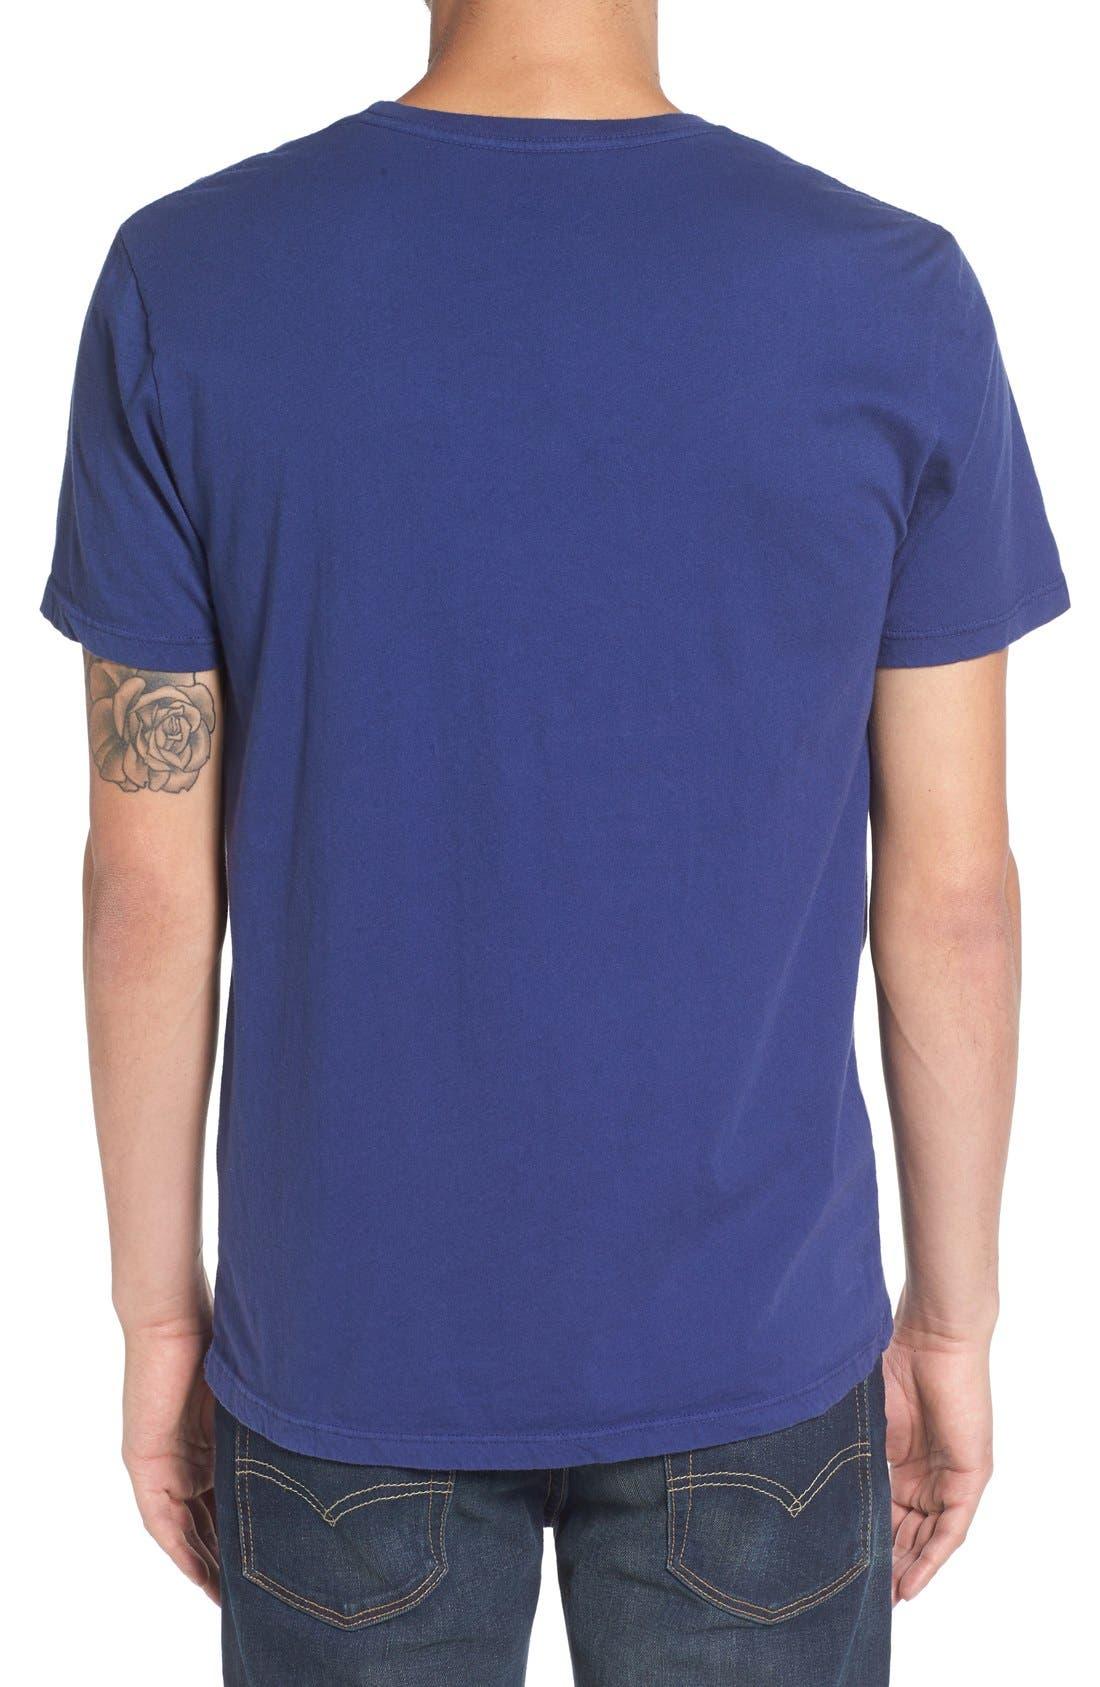 Alternate Image 2  - Altru 'Polaroid' T-Shirt